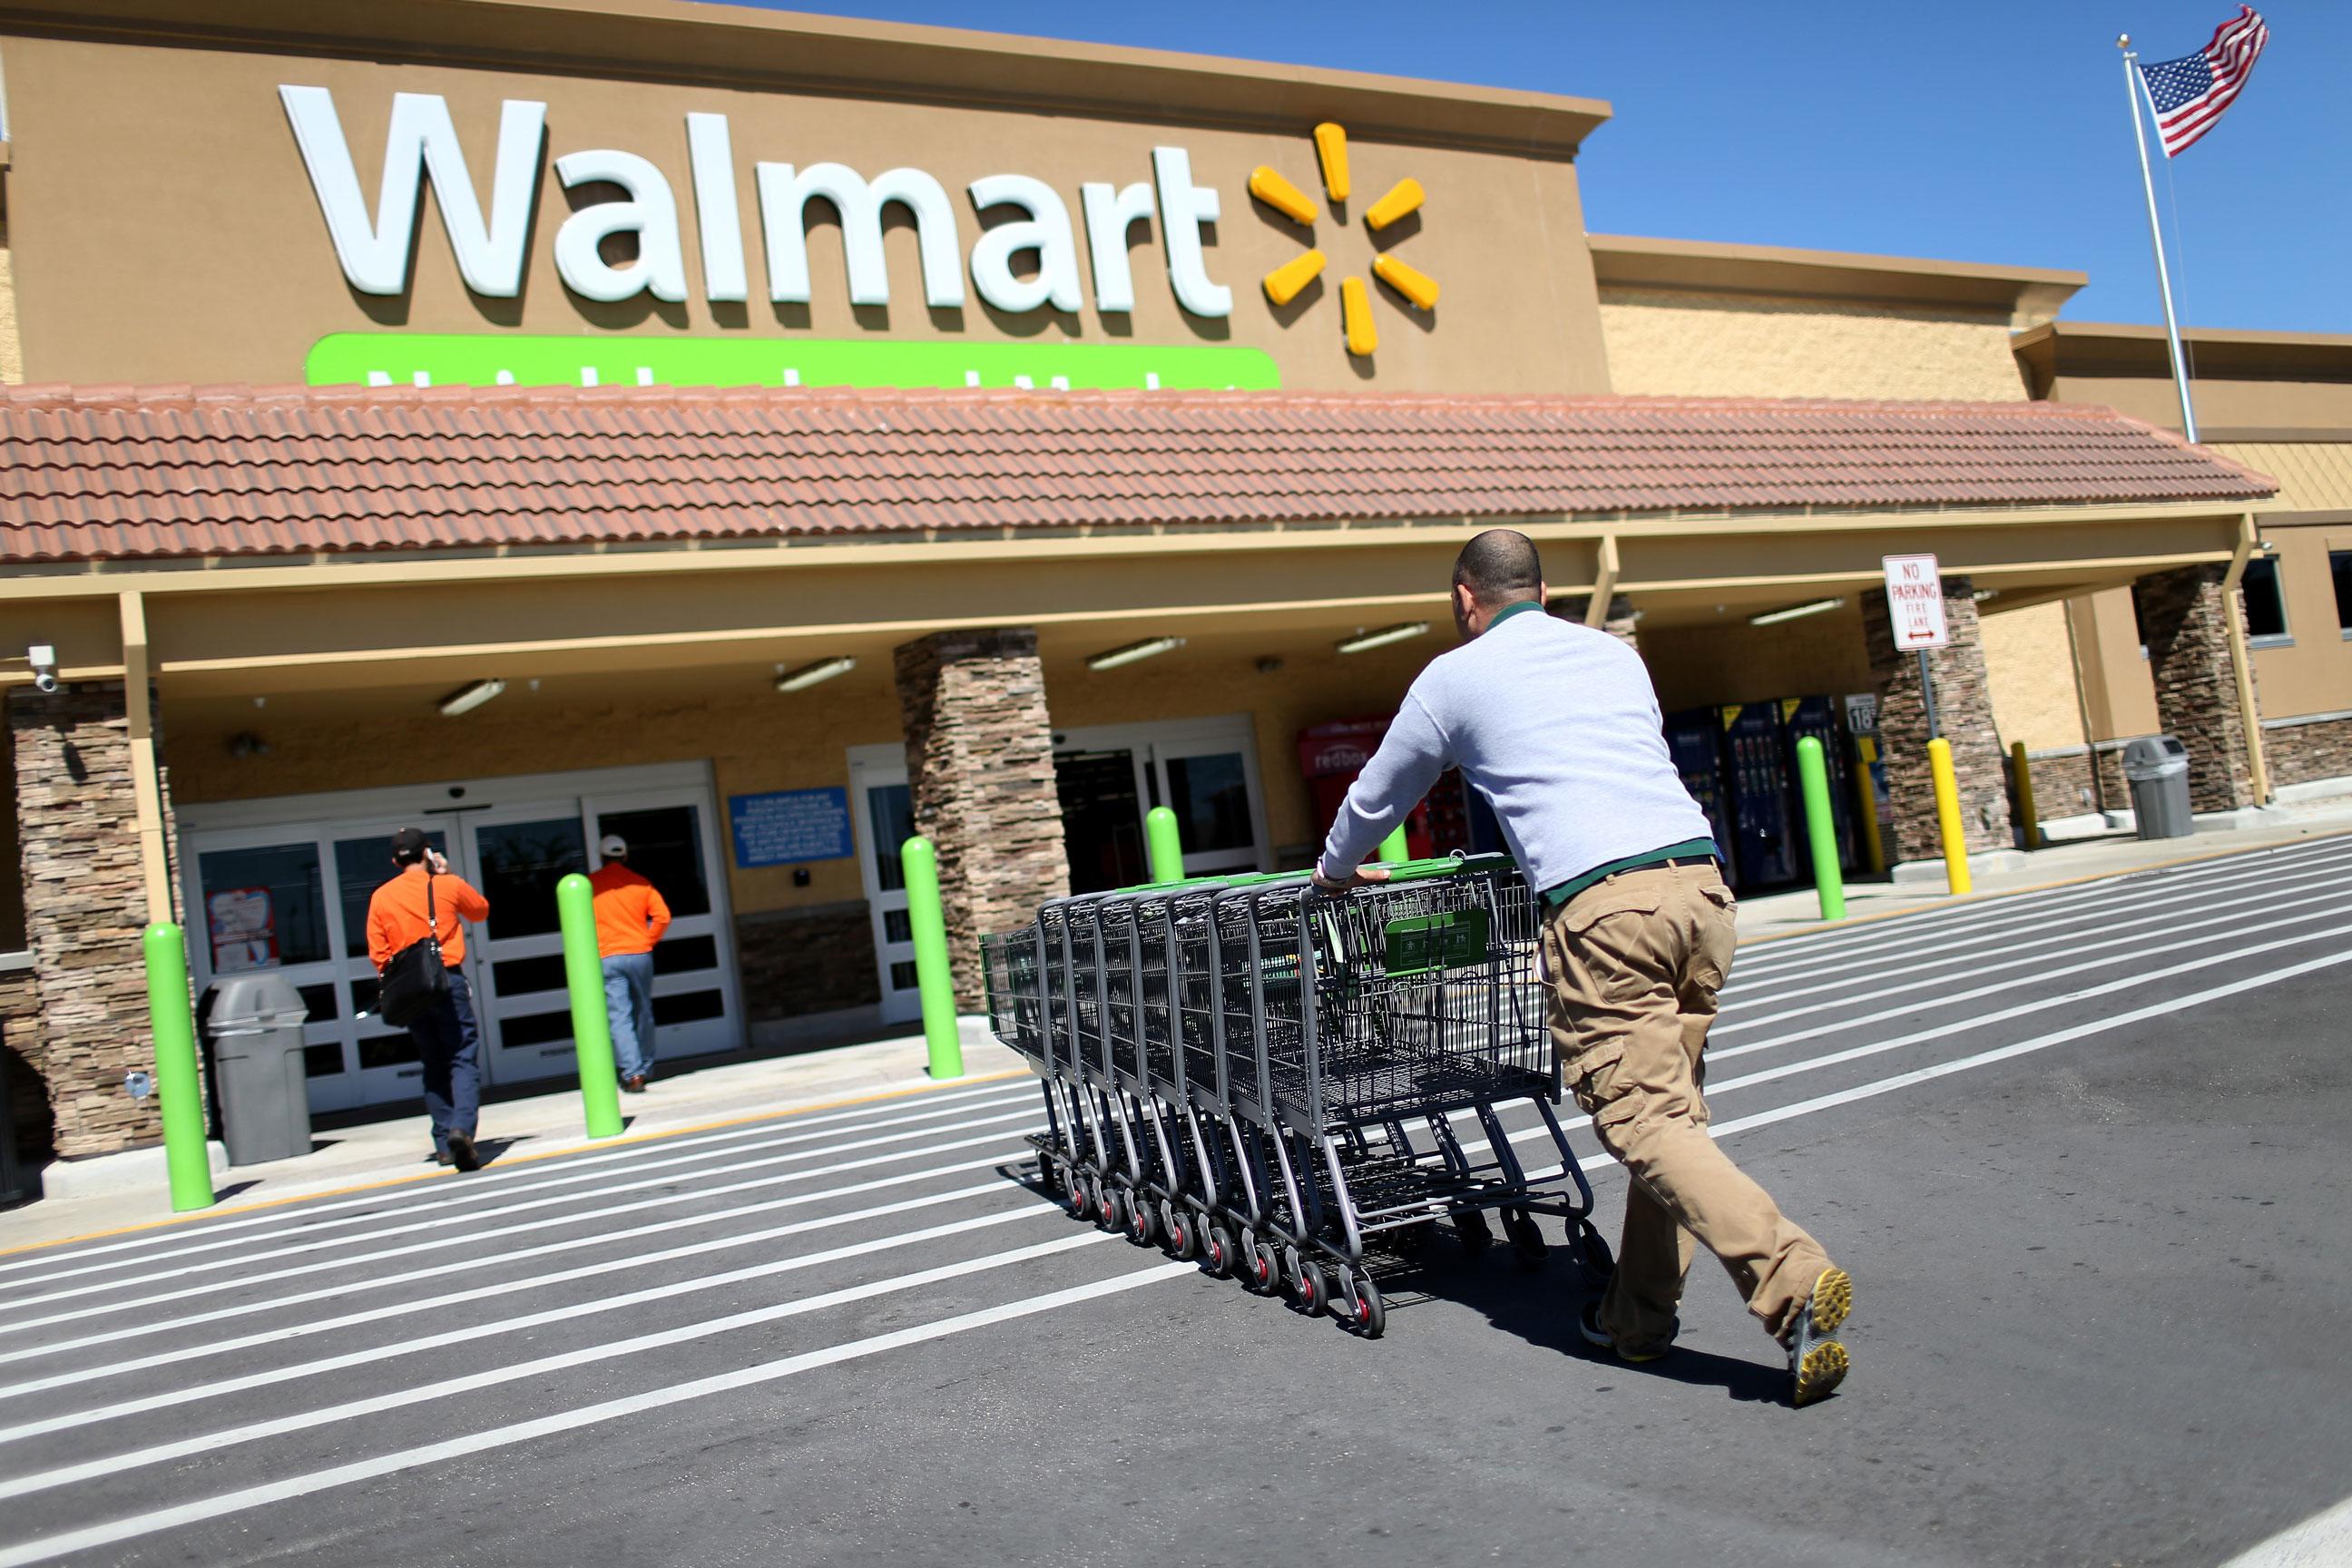 techcrunch.com - Brian Heater - Walmart enlists Microsoft cloud in battle against Amazon